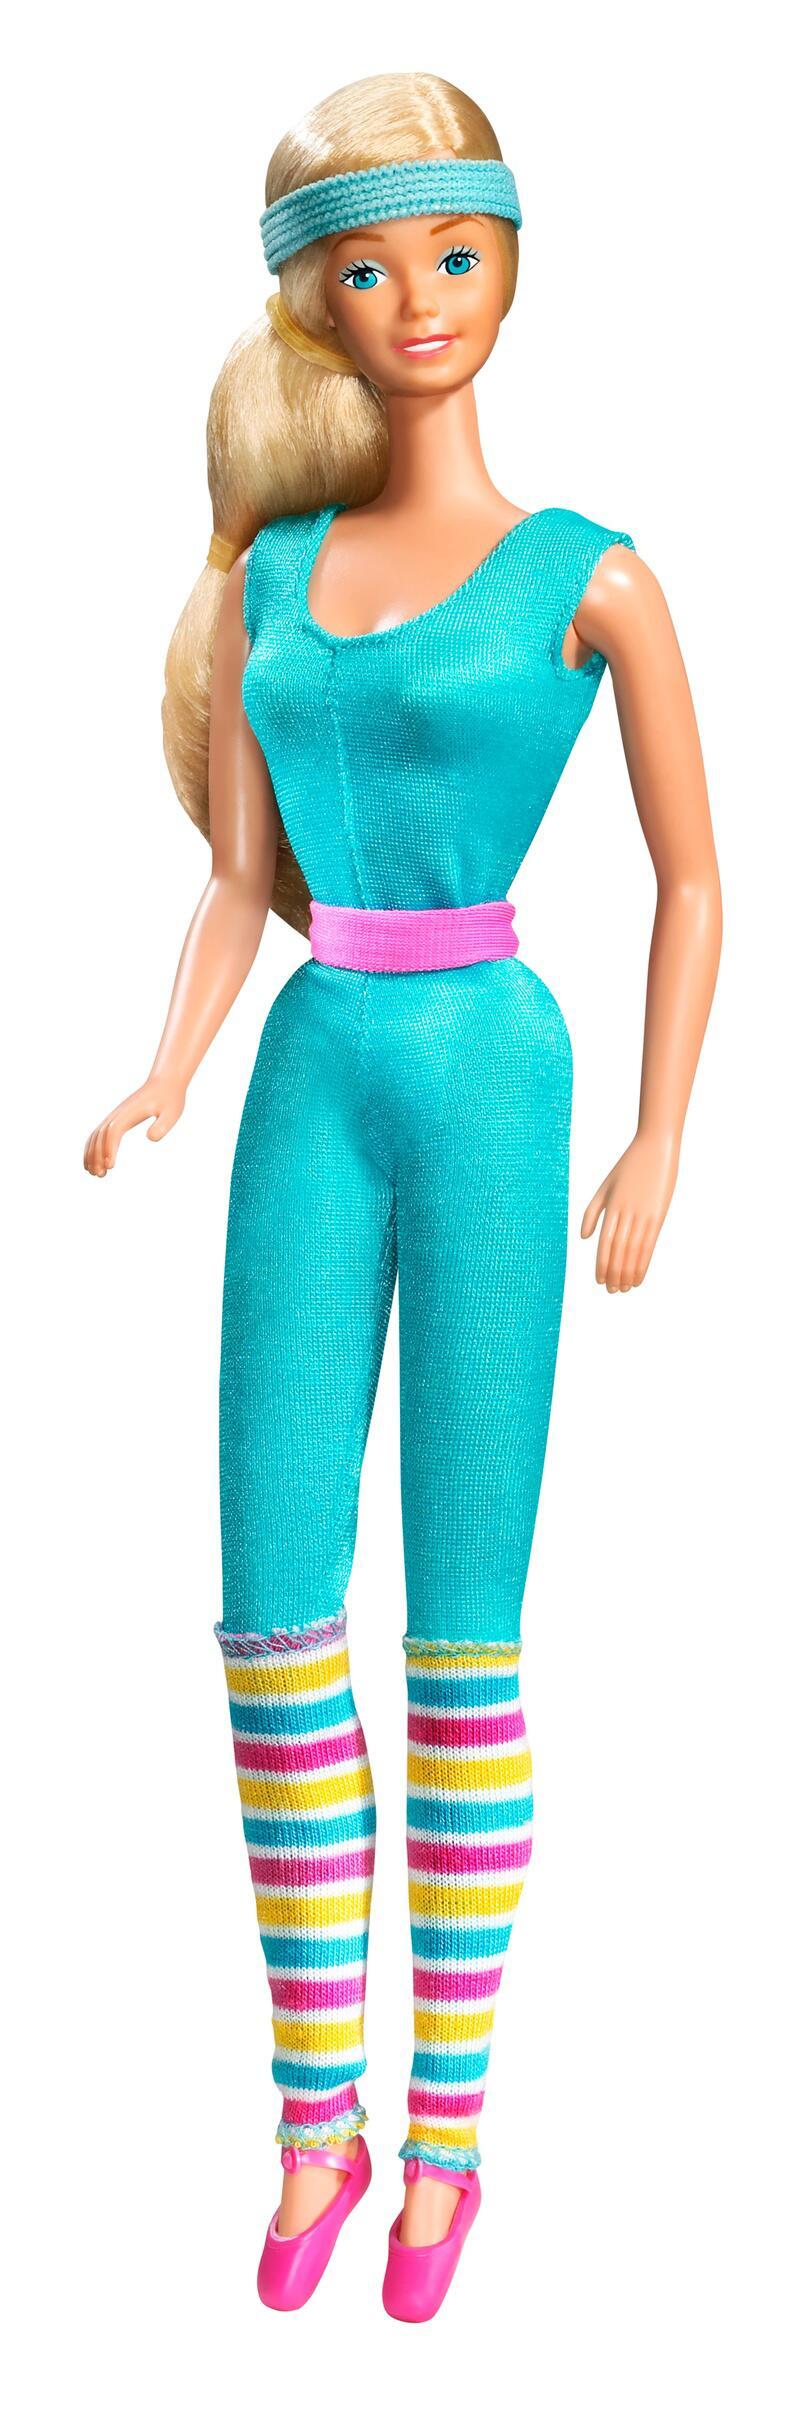 Bild zu 1984 - Aerobic - Barbie